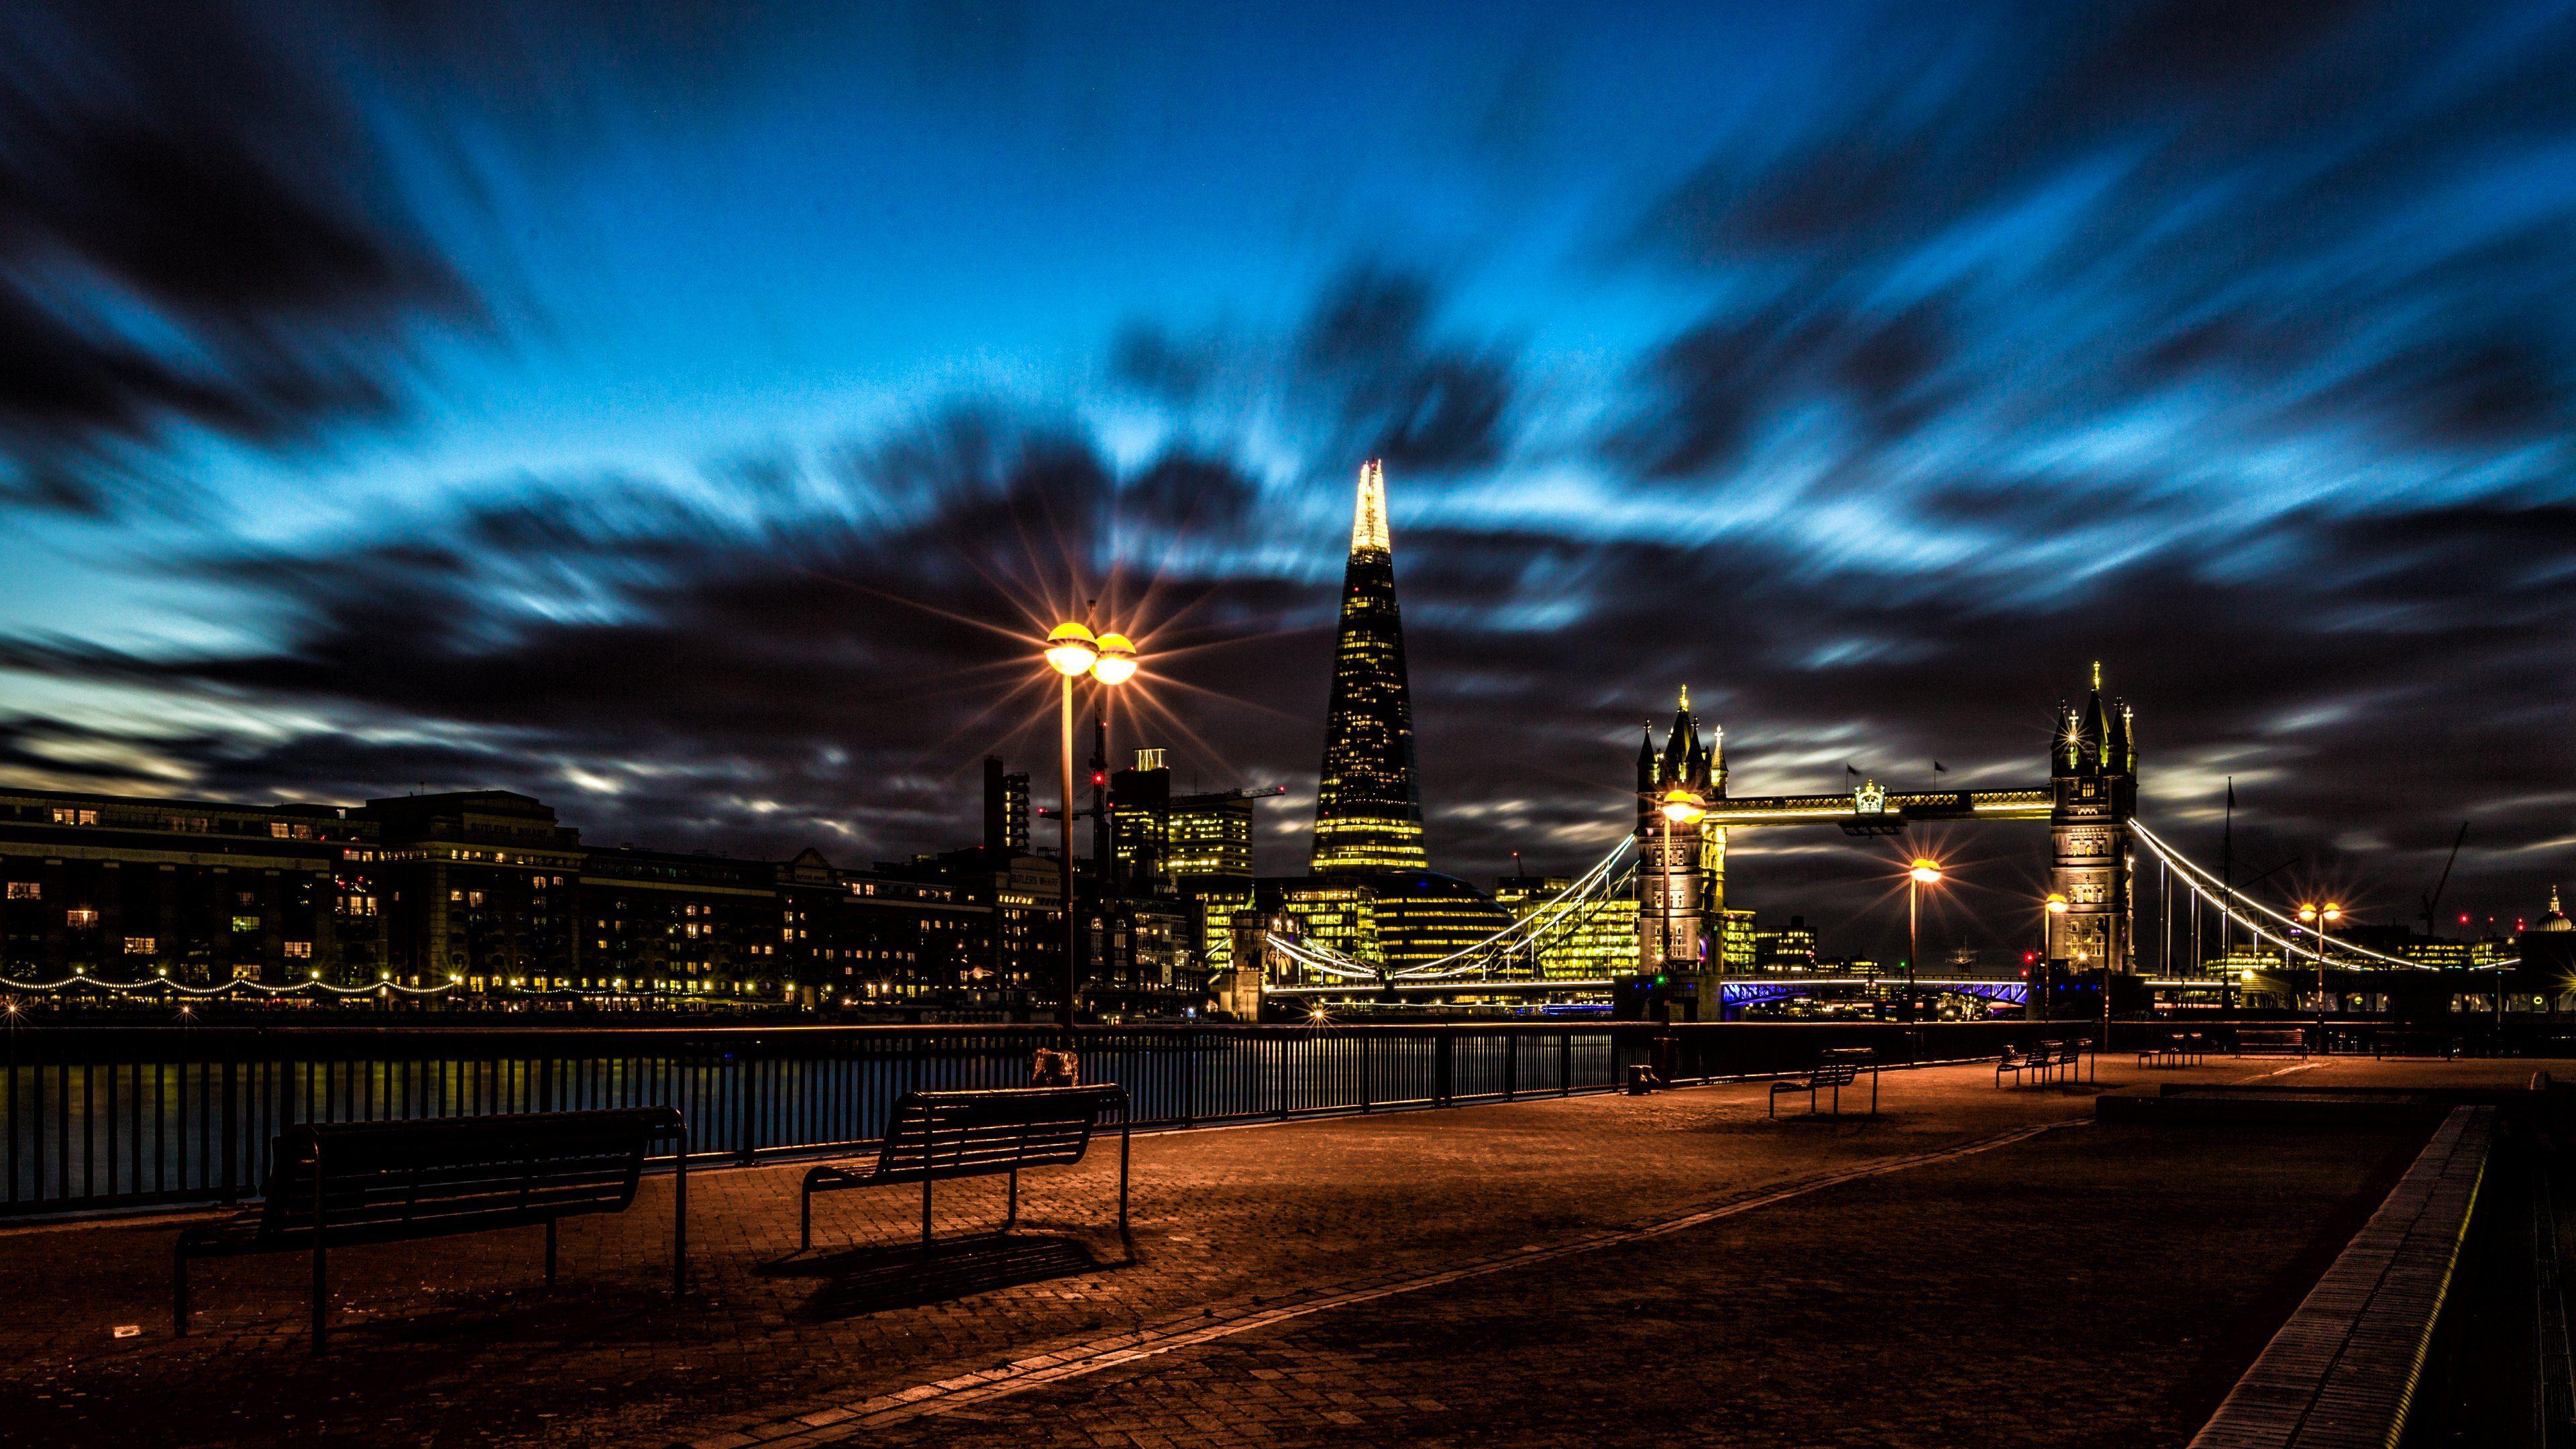 London Night Wallpapers - Top Free London Night ...